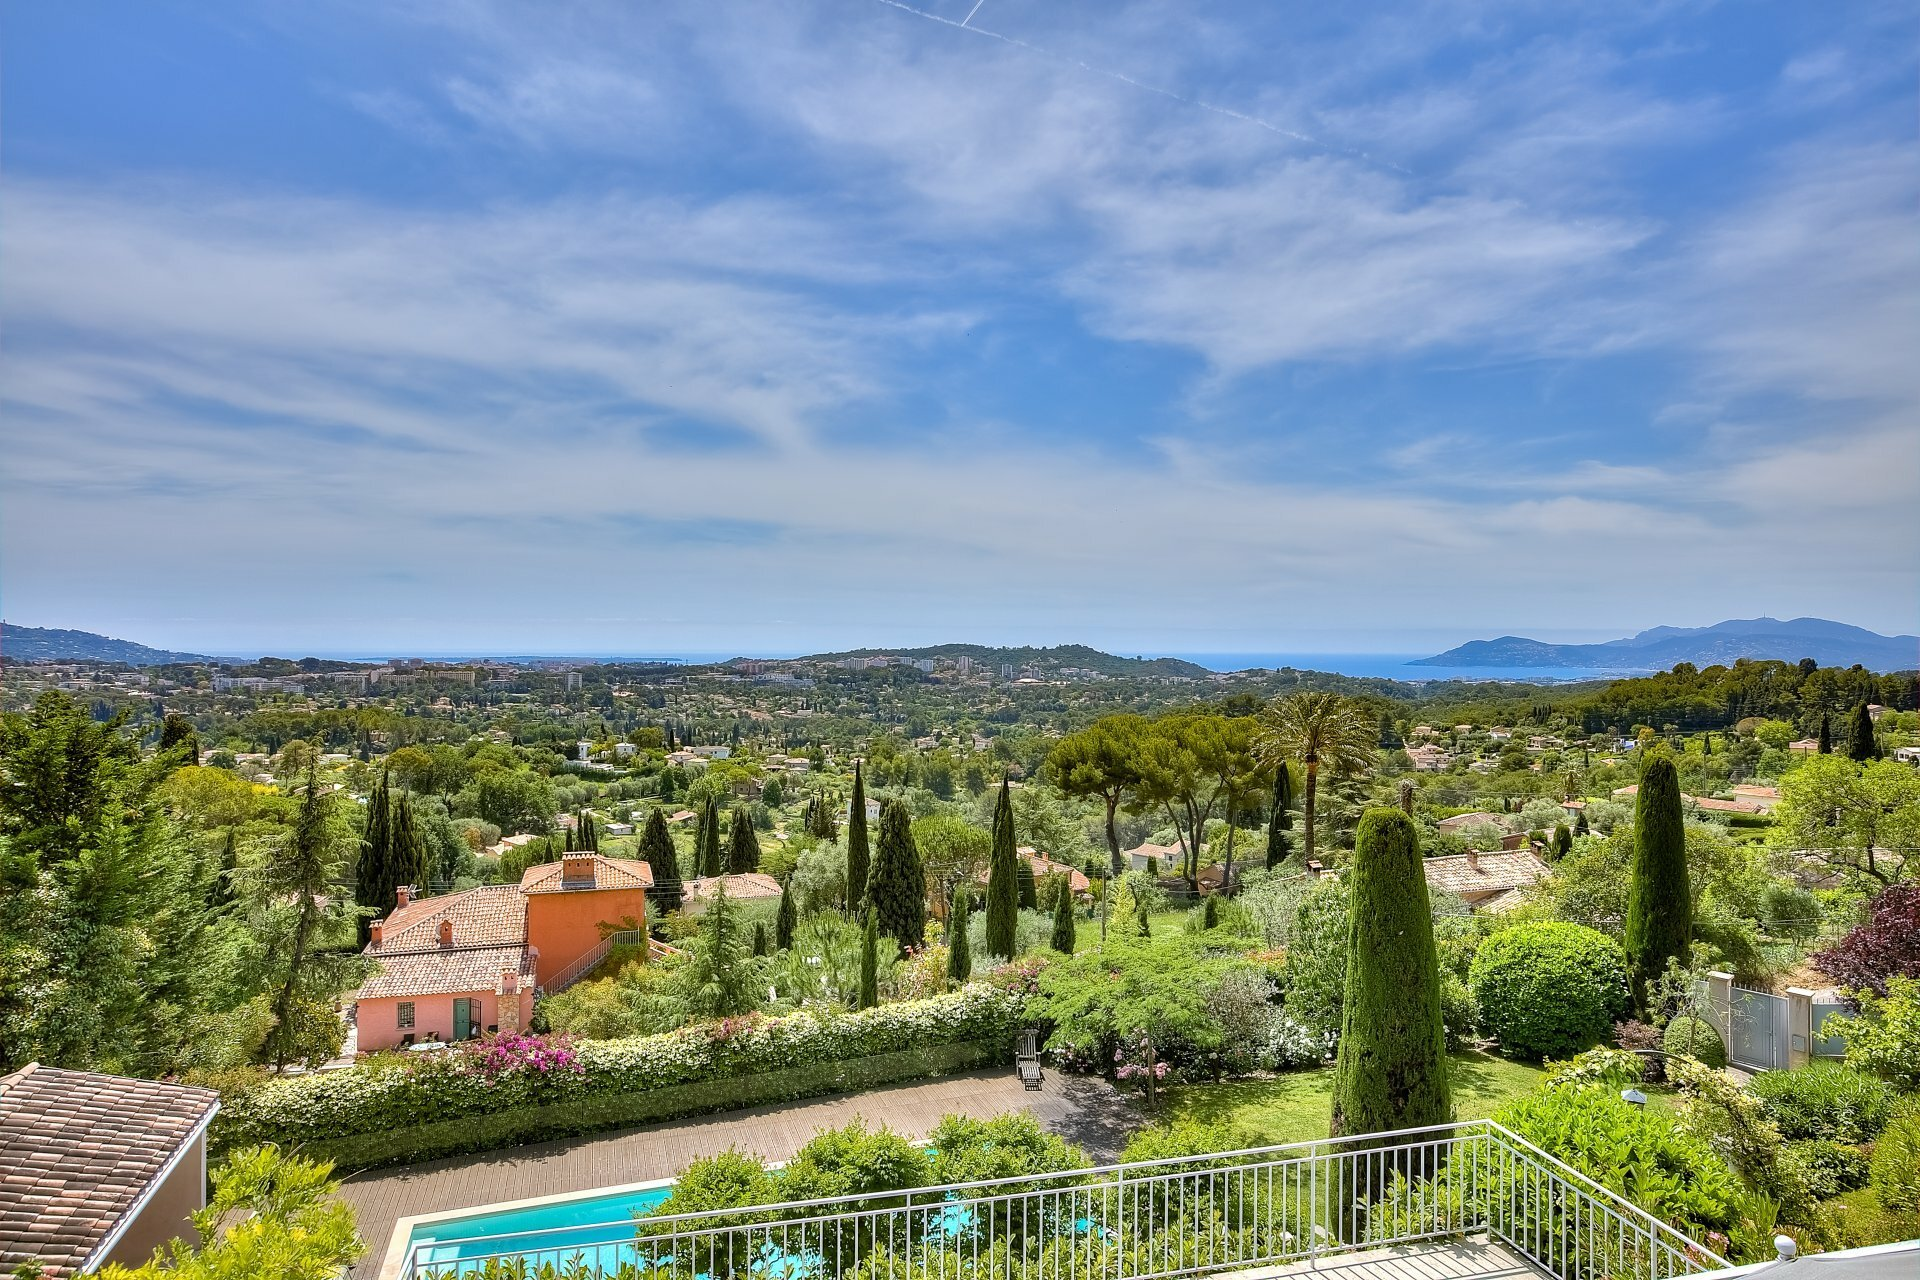 Villa in Mougins, Provence-Alpes-Côte d'Azur, France 1 - 11571257